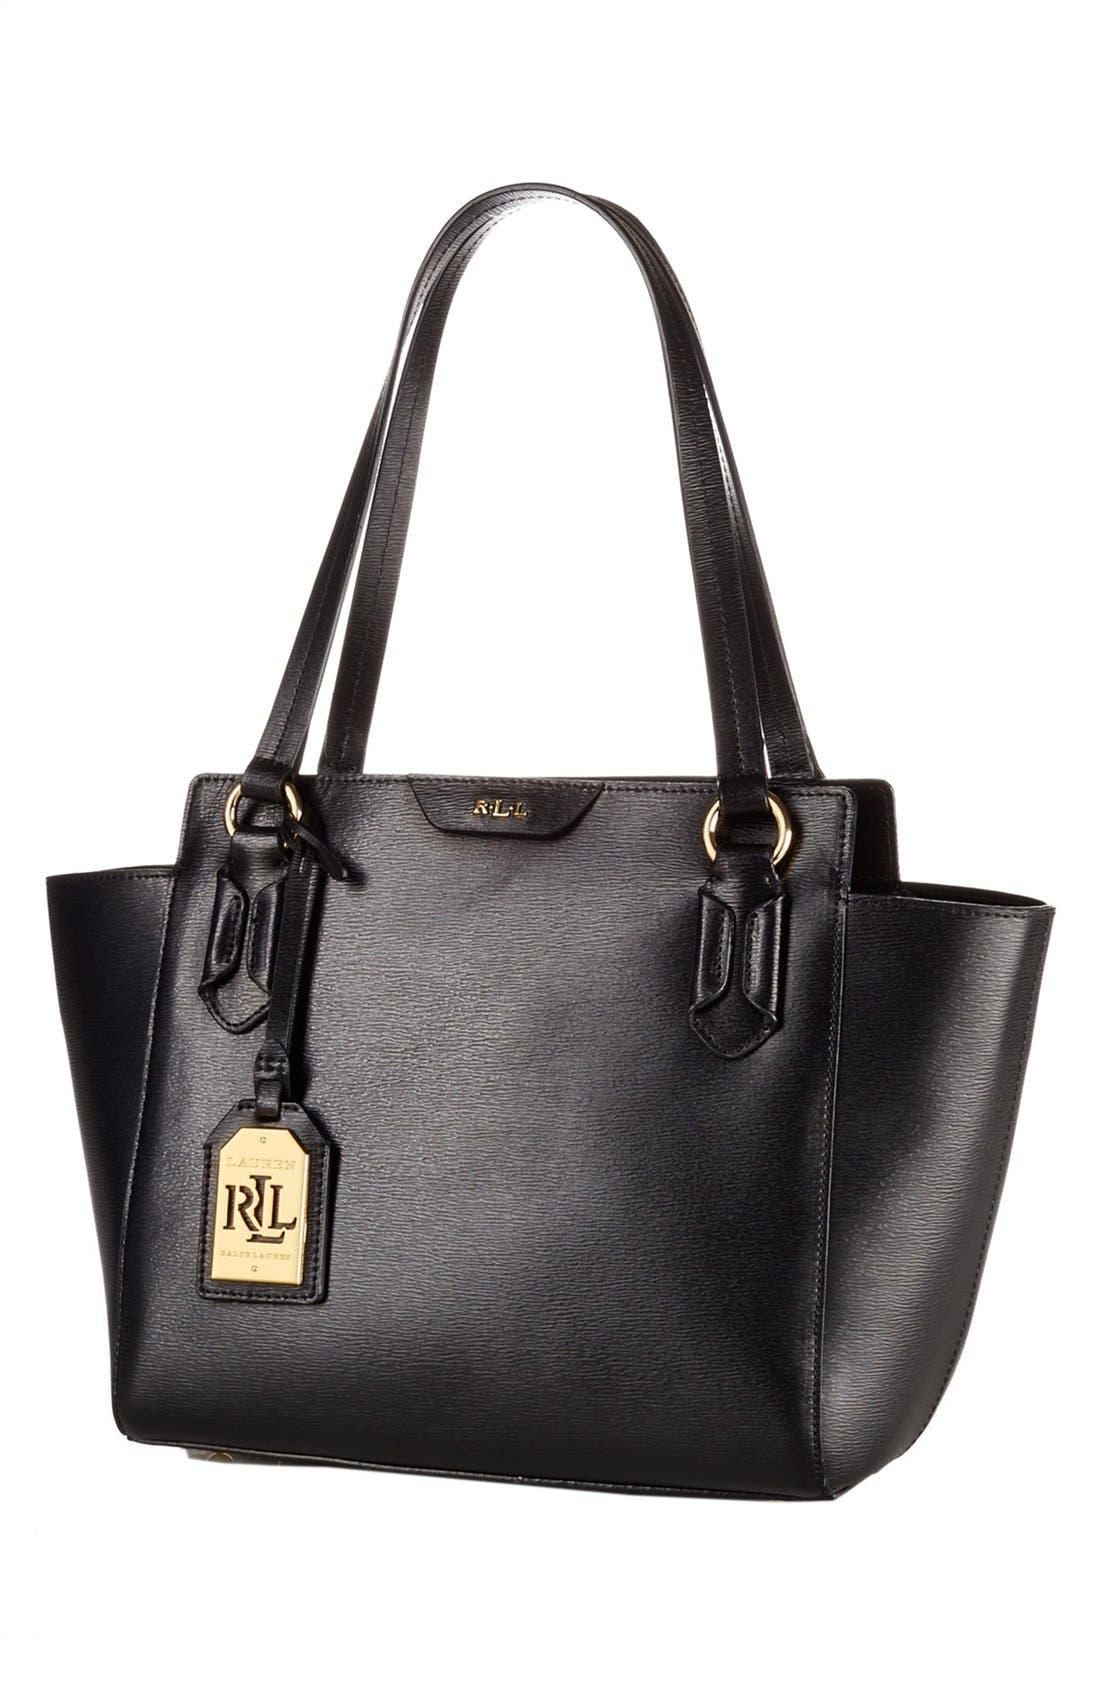 Main Image - Lauren Ralph Lauren 'Tate' Leather Shopper